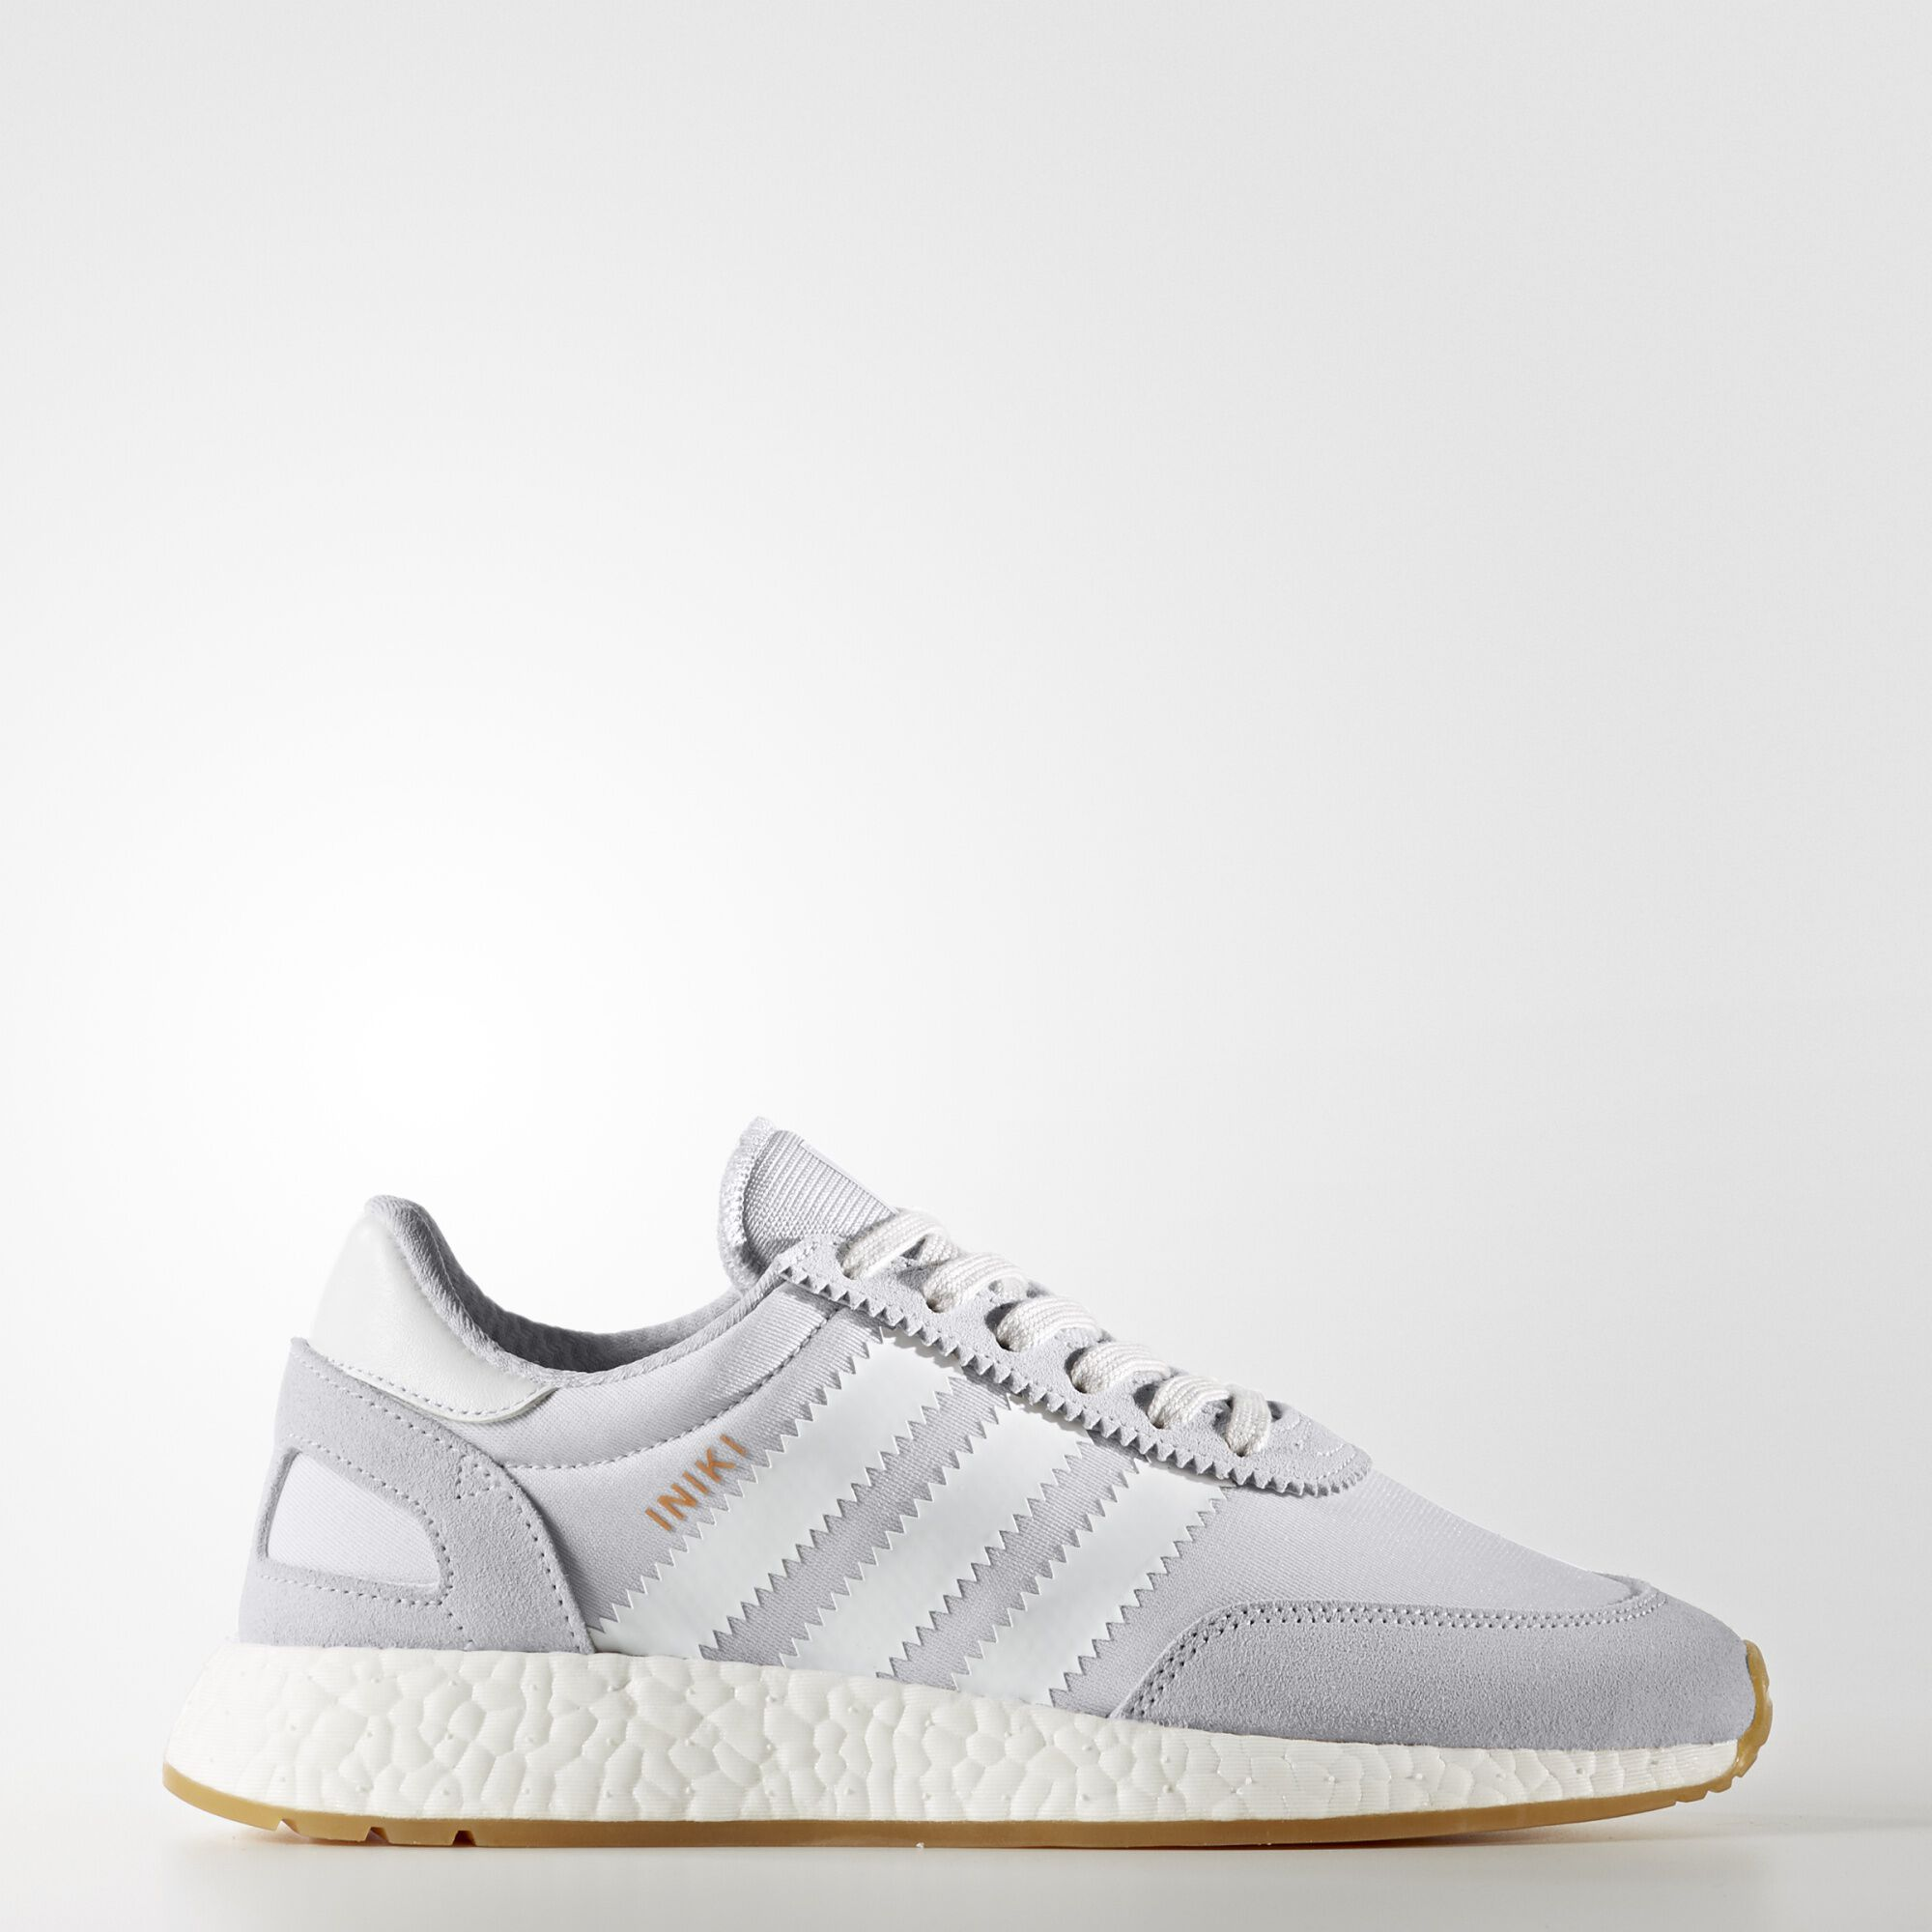 Iniki Shoes Adidas